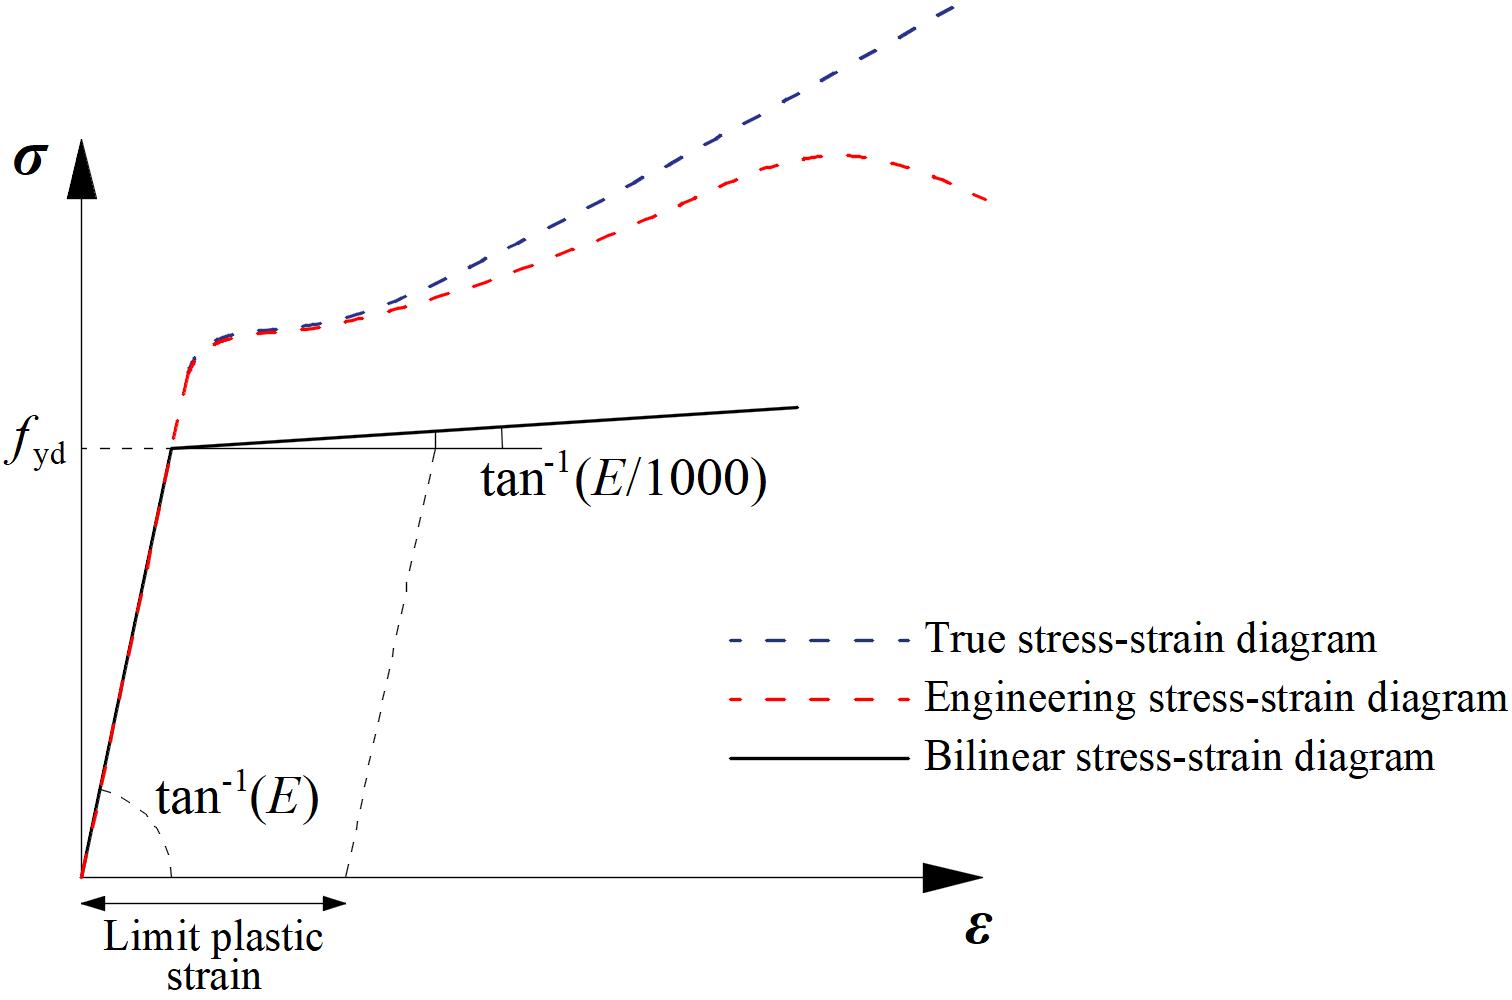 spannings-rek diagram van materiaal model in CBFEM IDEA CONNECTION